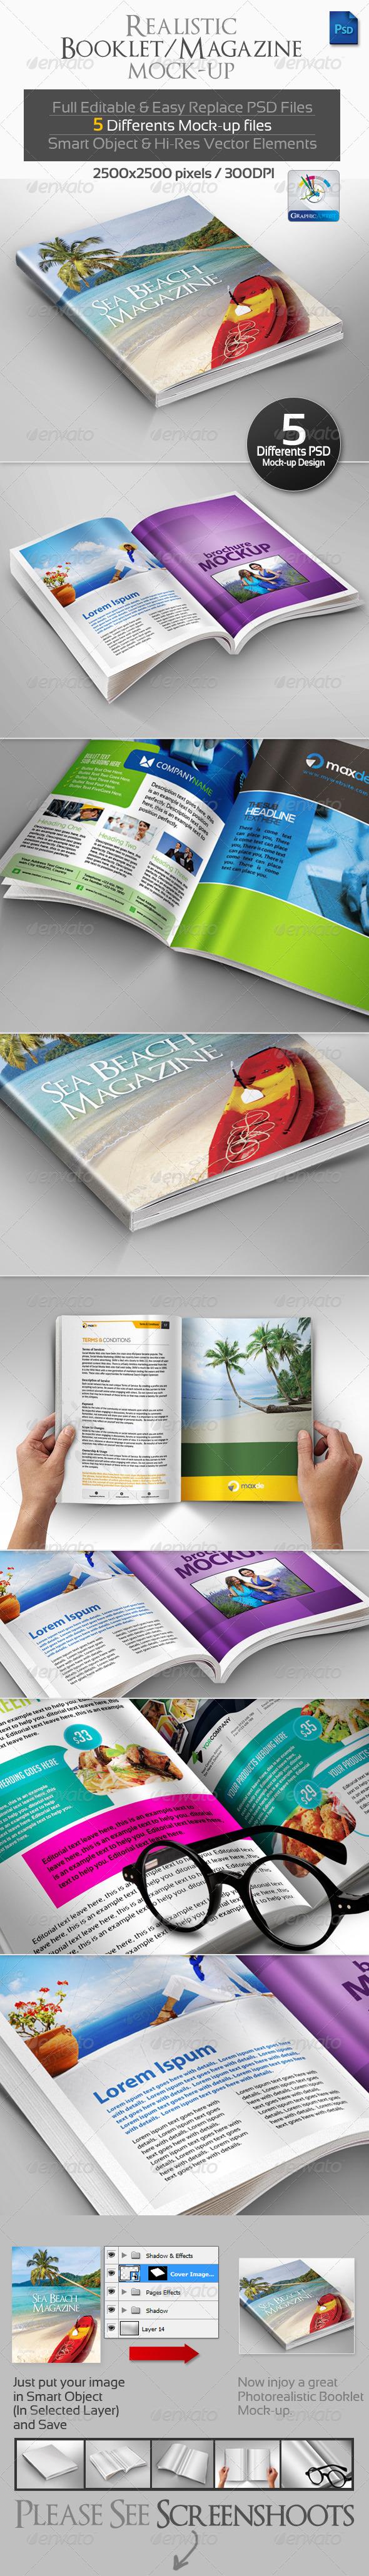 Realistic Booklet/Magazine Mock-ups - Magazines Print